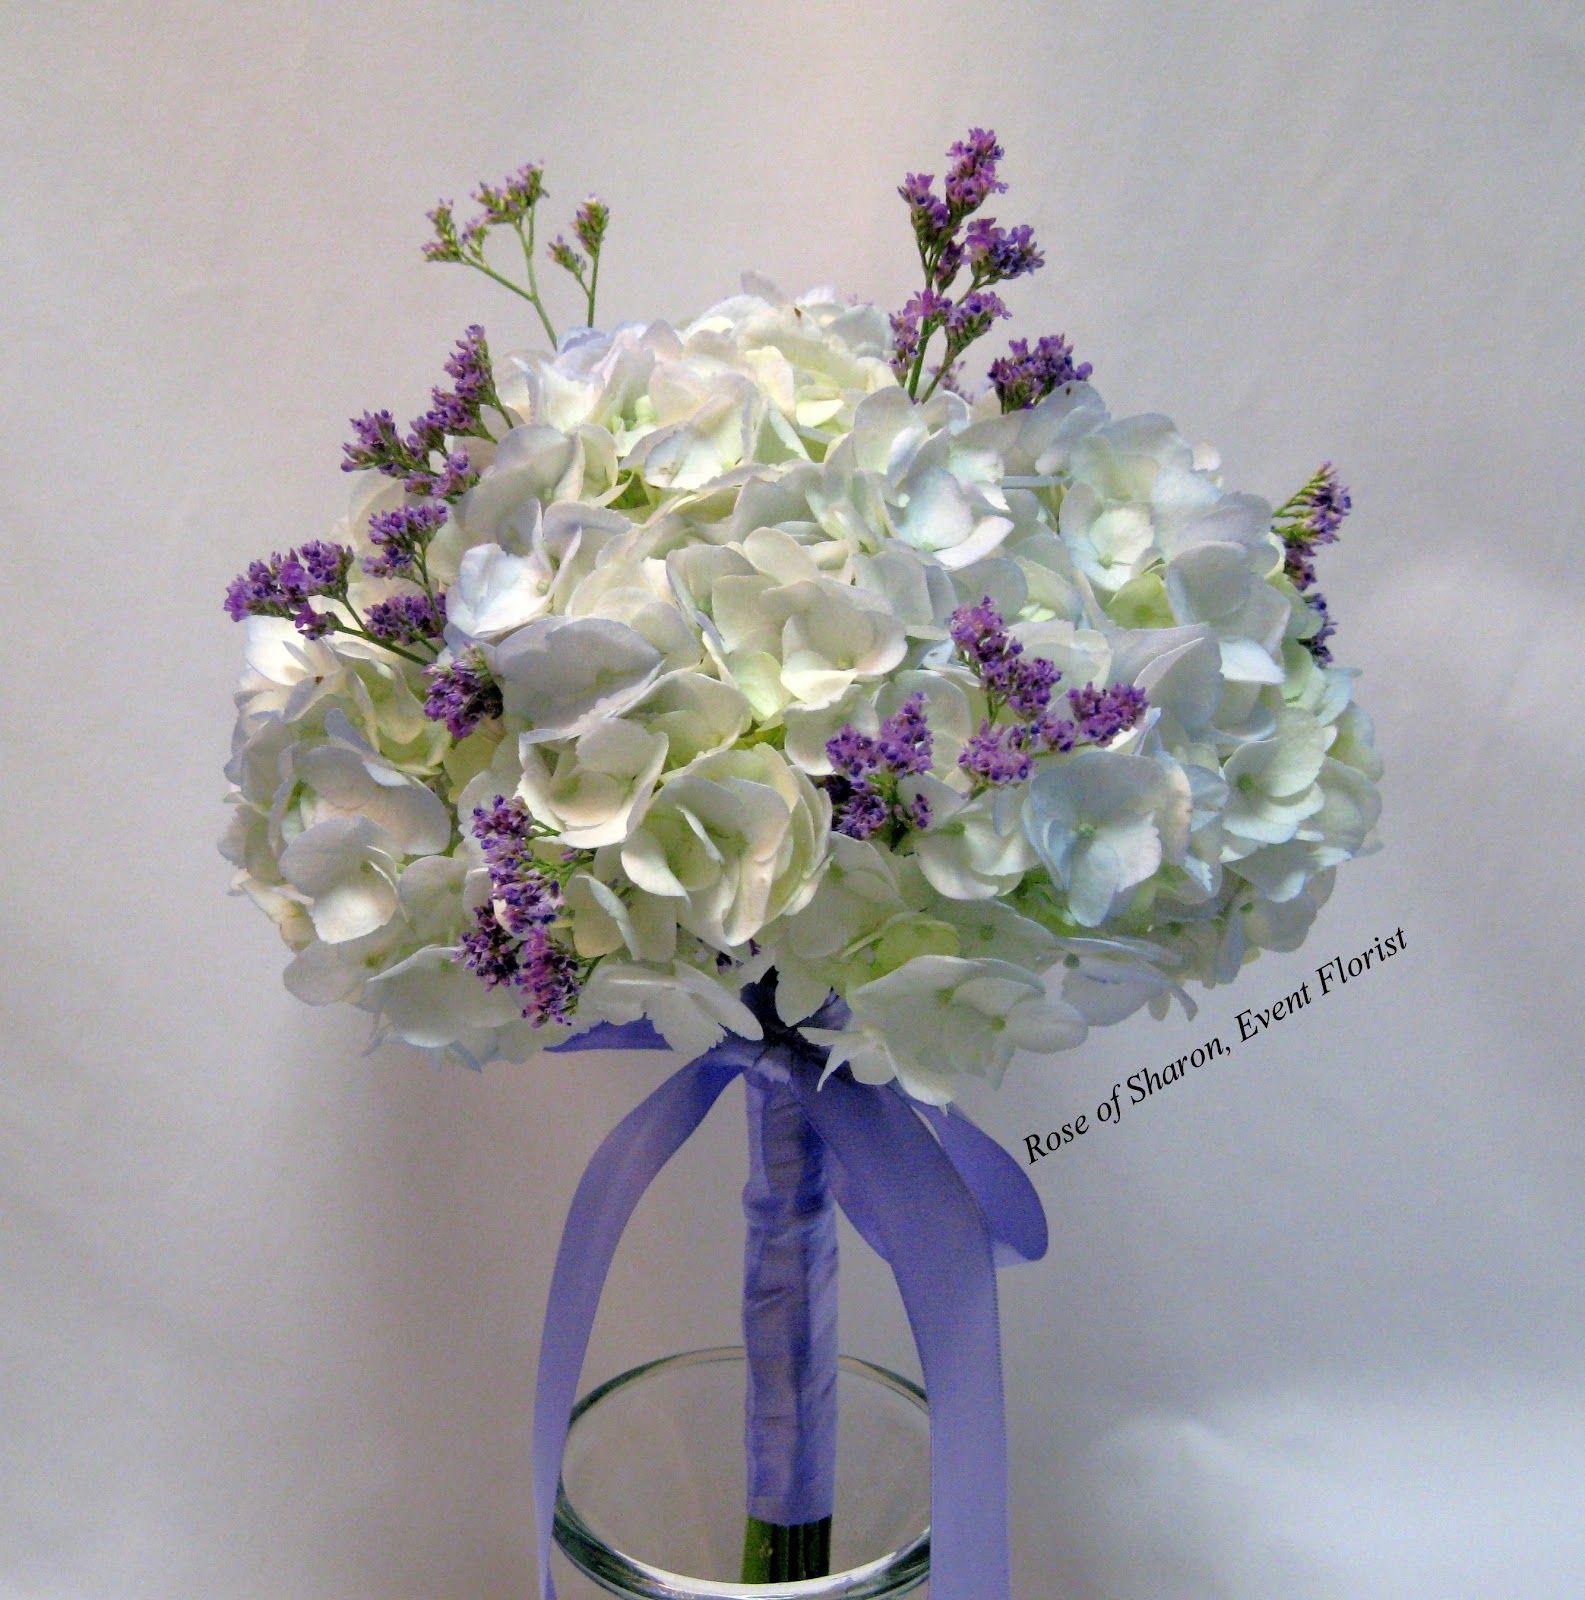 Limonium is a feathery bluepurple flower that looks marvelous as an limonium is a feathery bluepurple flower that looks marvelous as an accent in bridal izmirmasajfo